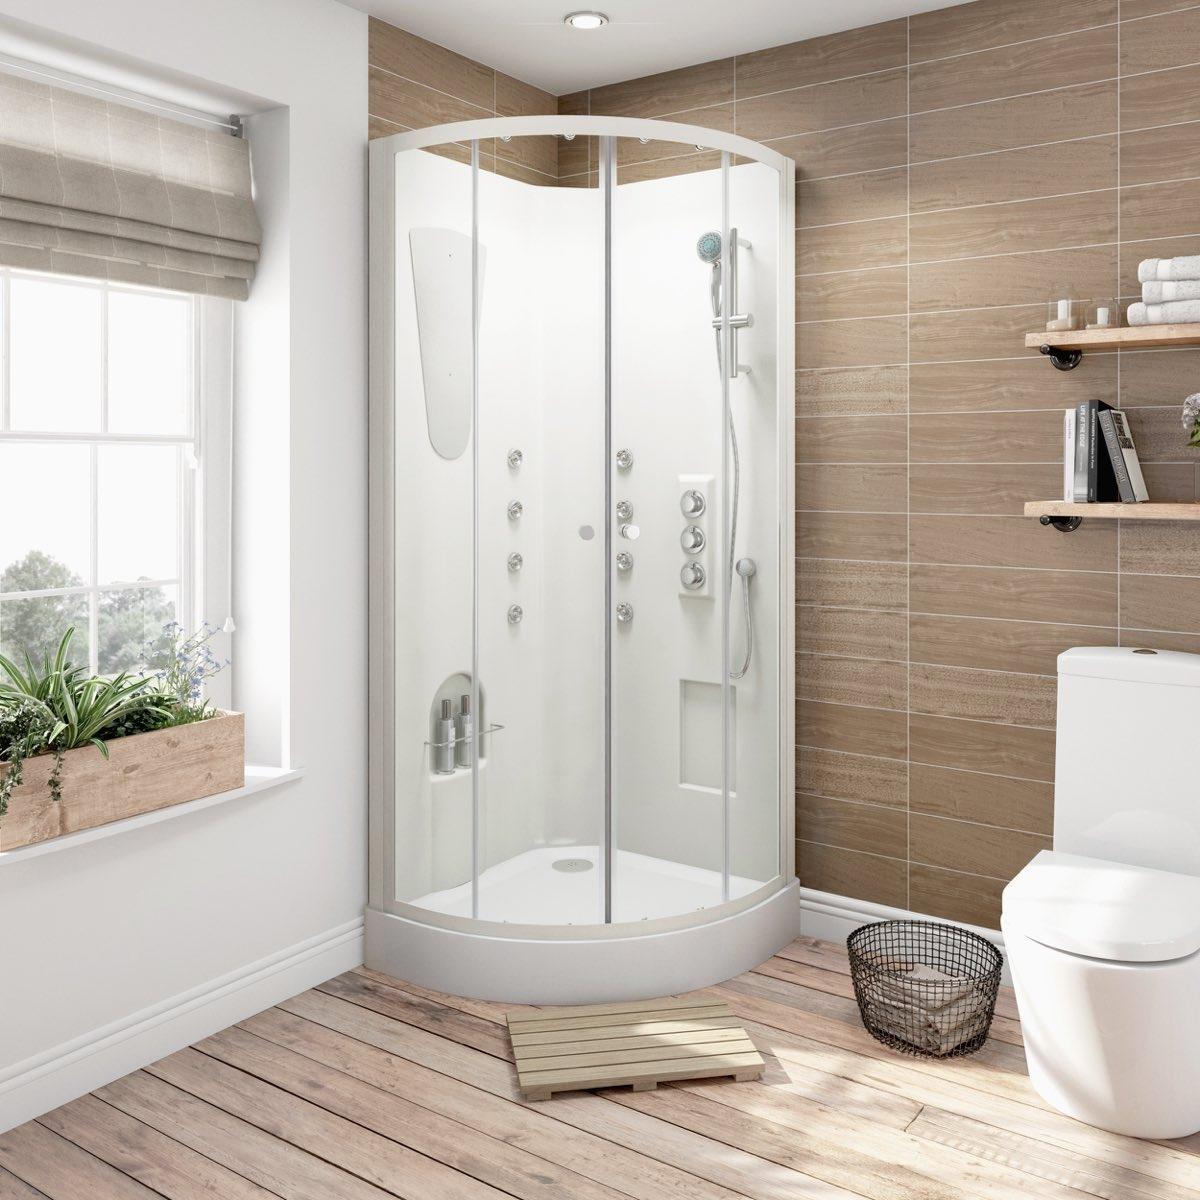 dizajn malenkoj vannoj komnaty s dushevoj kabinoj 2 - Идеи интерьера ванной комнаты